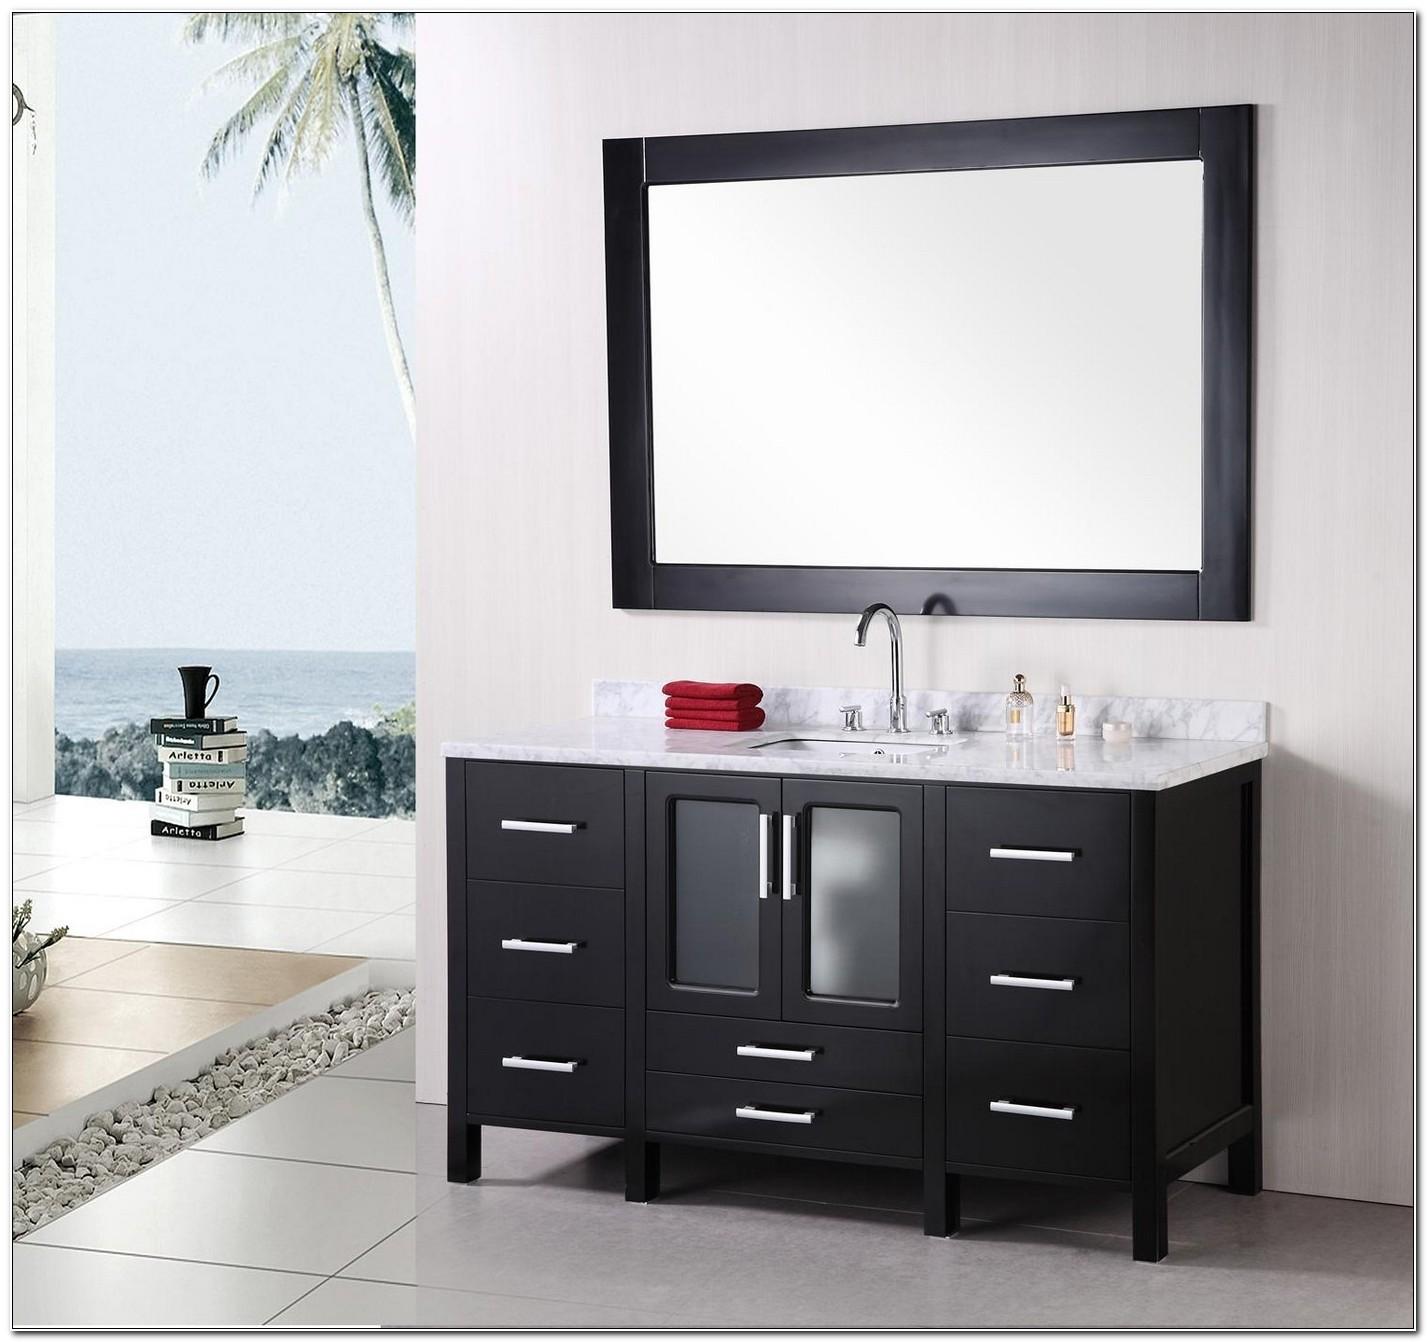 Menards Bathroom Storage Cabinets